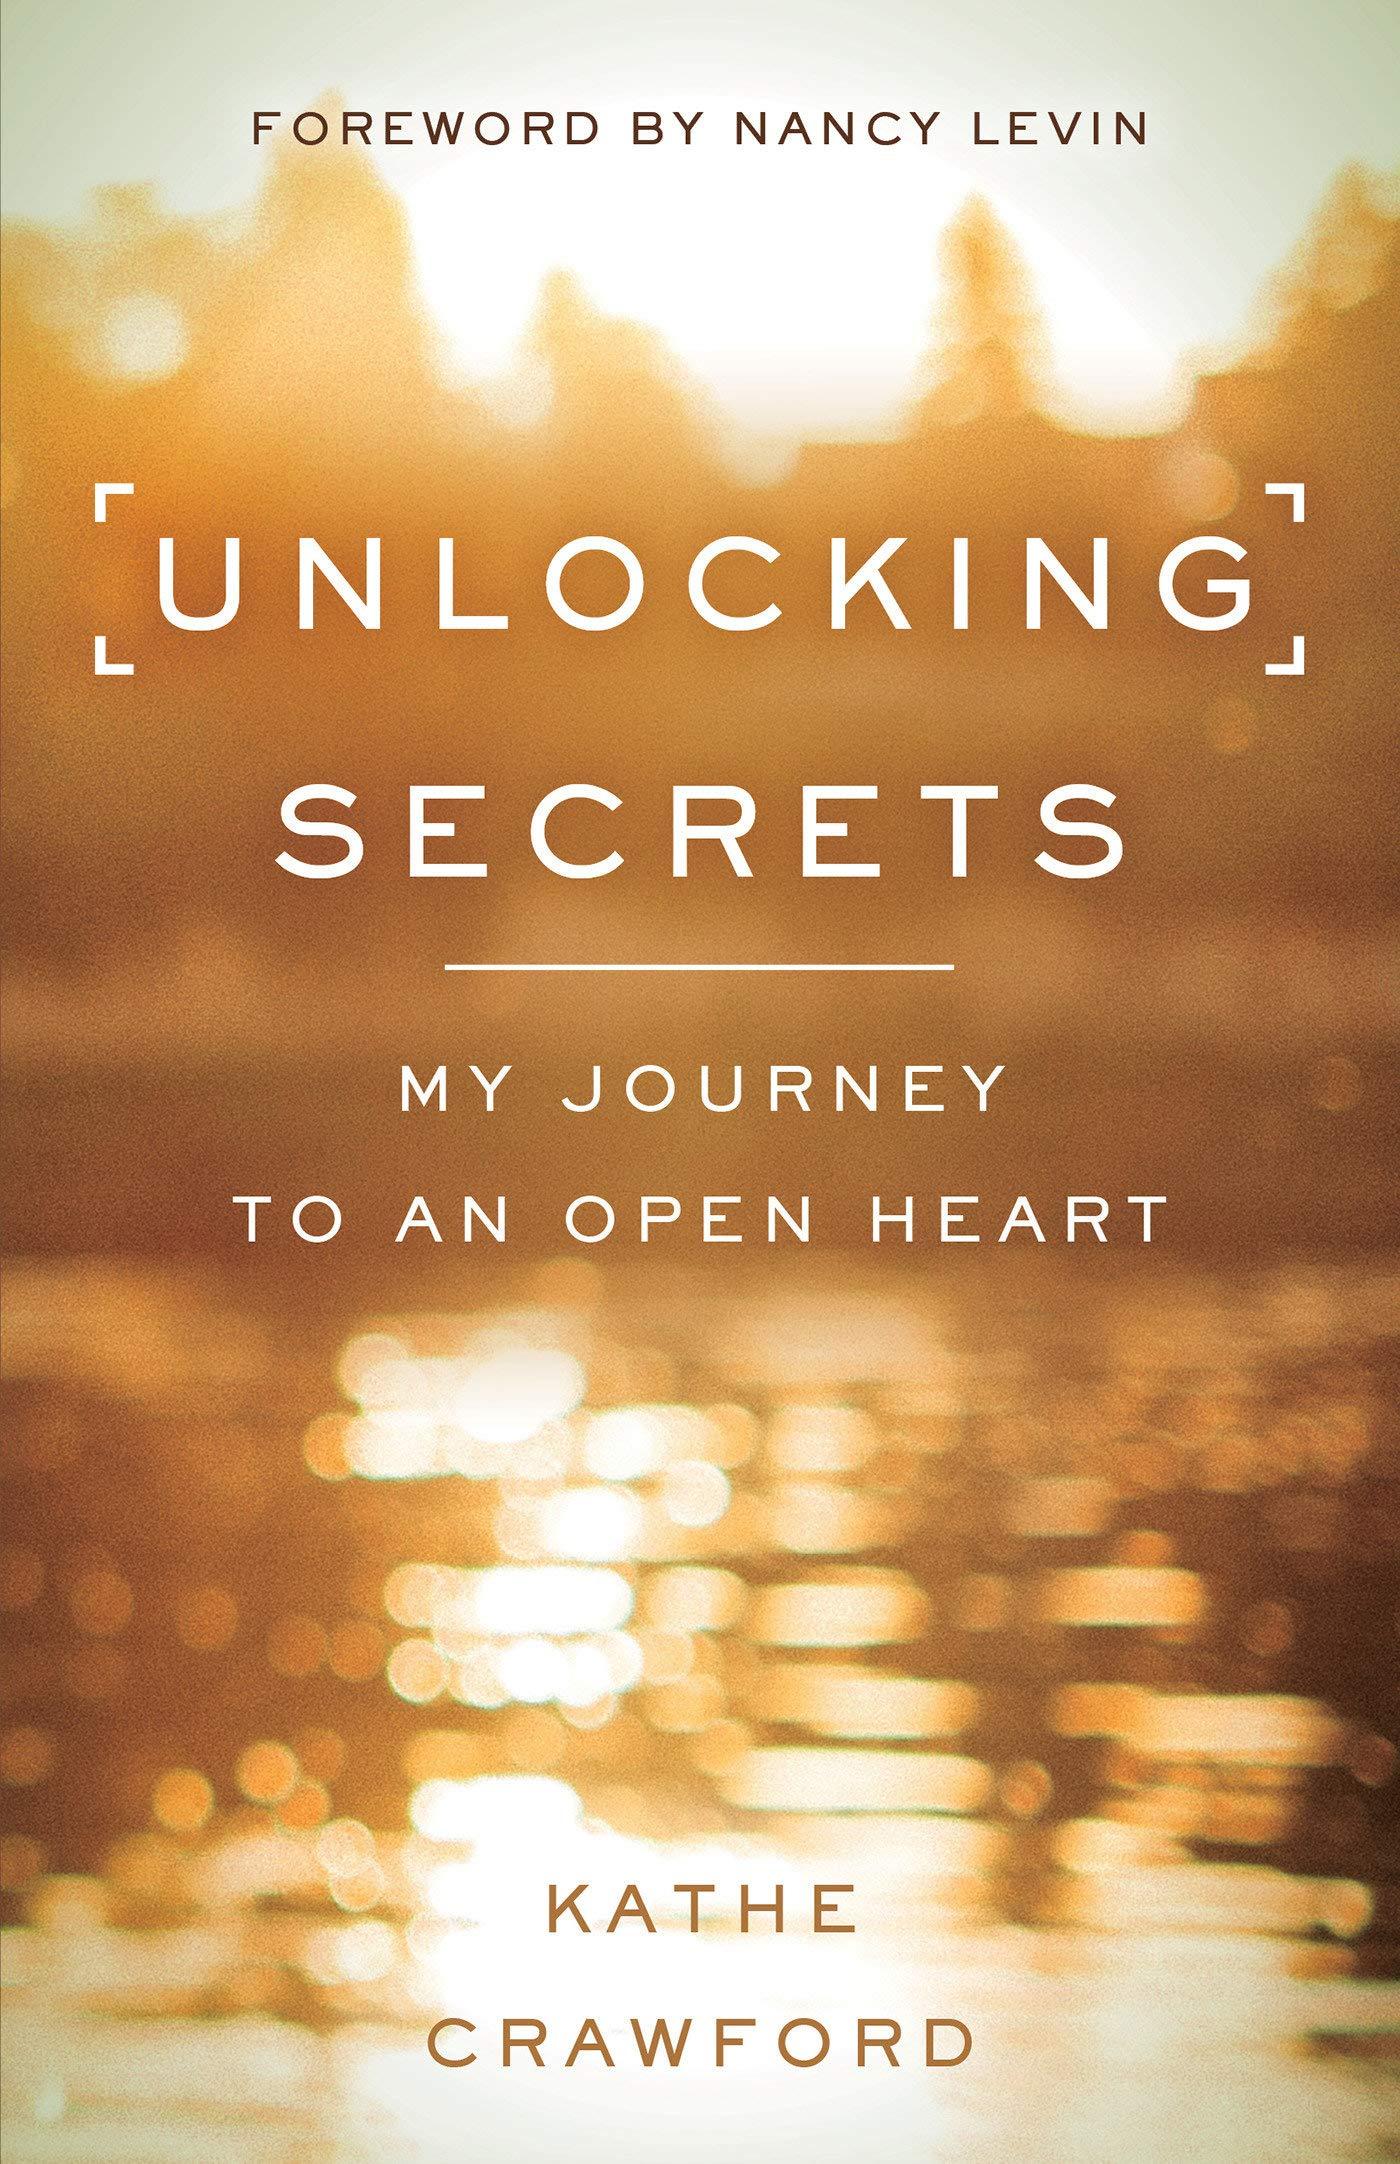 Unlocking Secrets: My Journey to an Open Heart: Kathe Crawford:  9781401953270: Amazon.com: Books